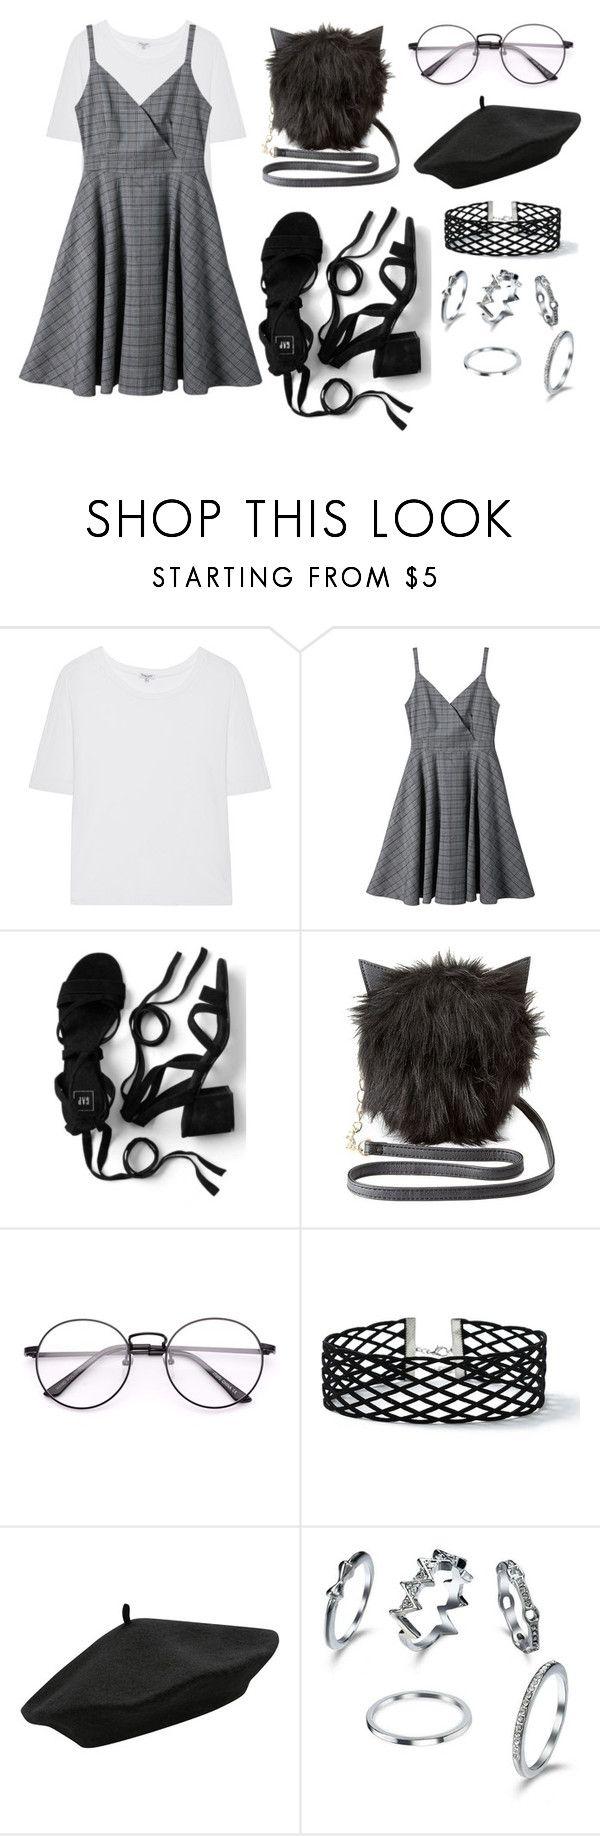 """Back to the 90's"" by ingrid-ramirez-trujillo on Polyvore featuring moda, Splendid, Charlotte Russe, Miss Selfridge, M&Co y blackandwhite"